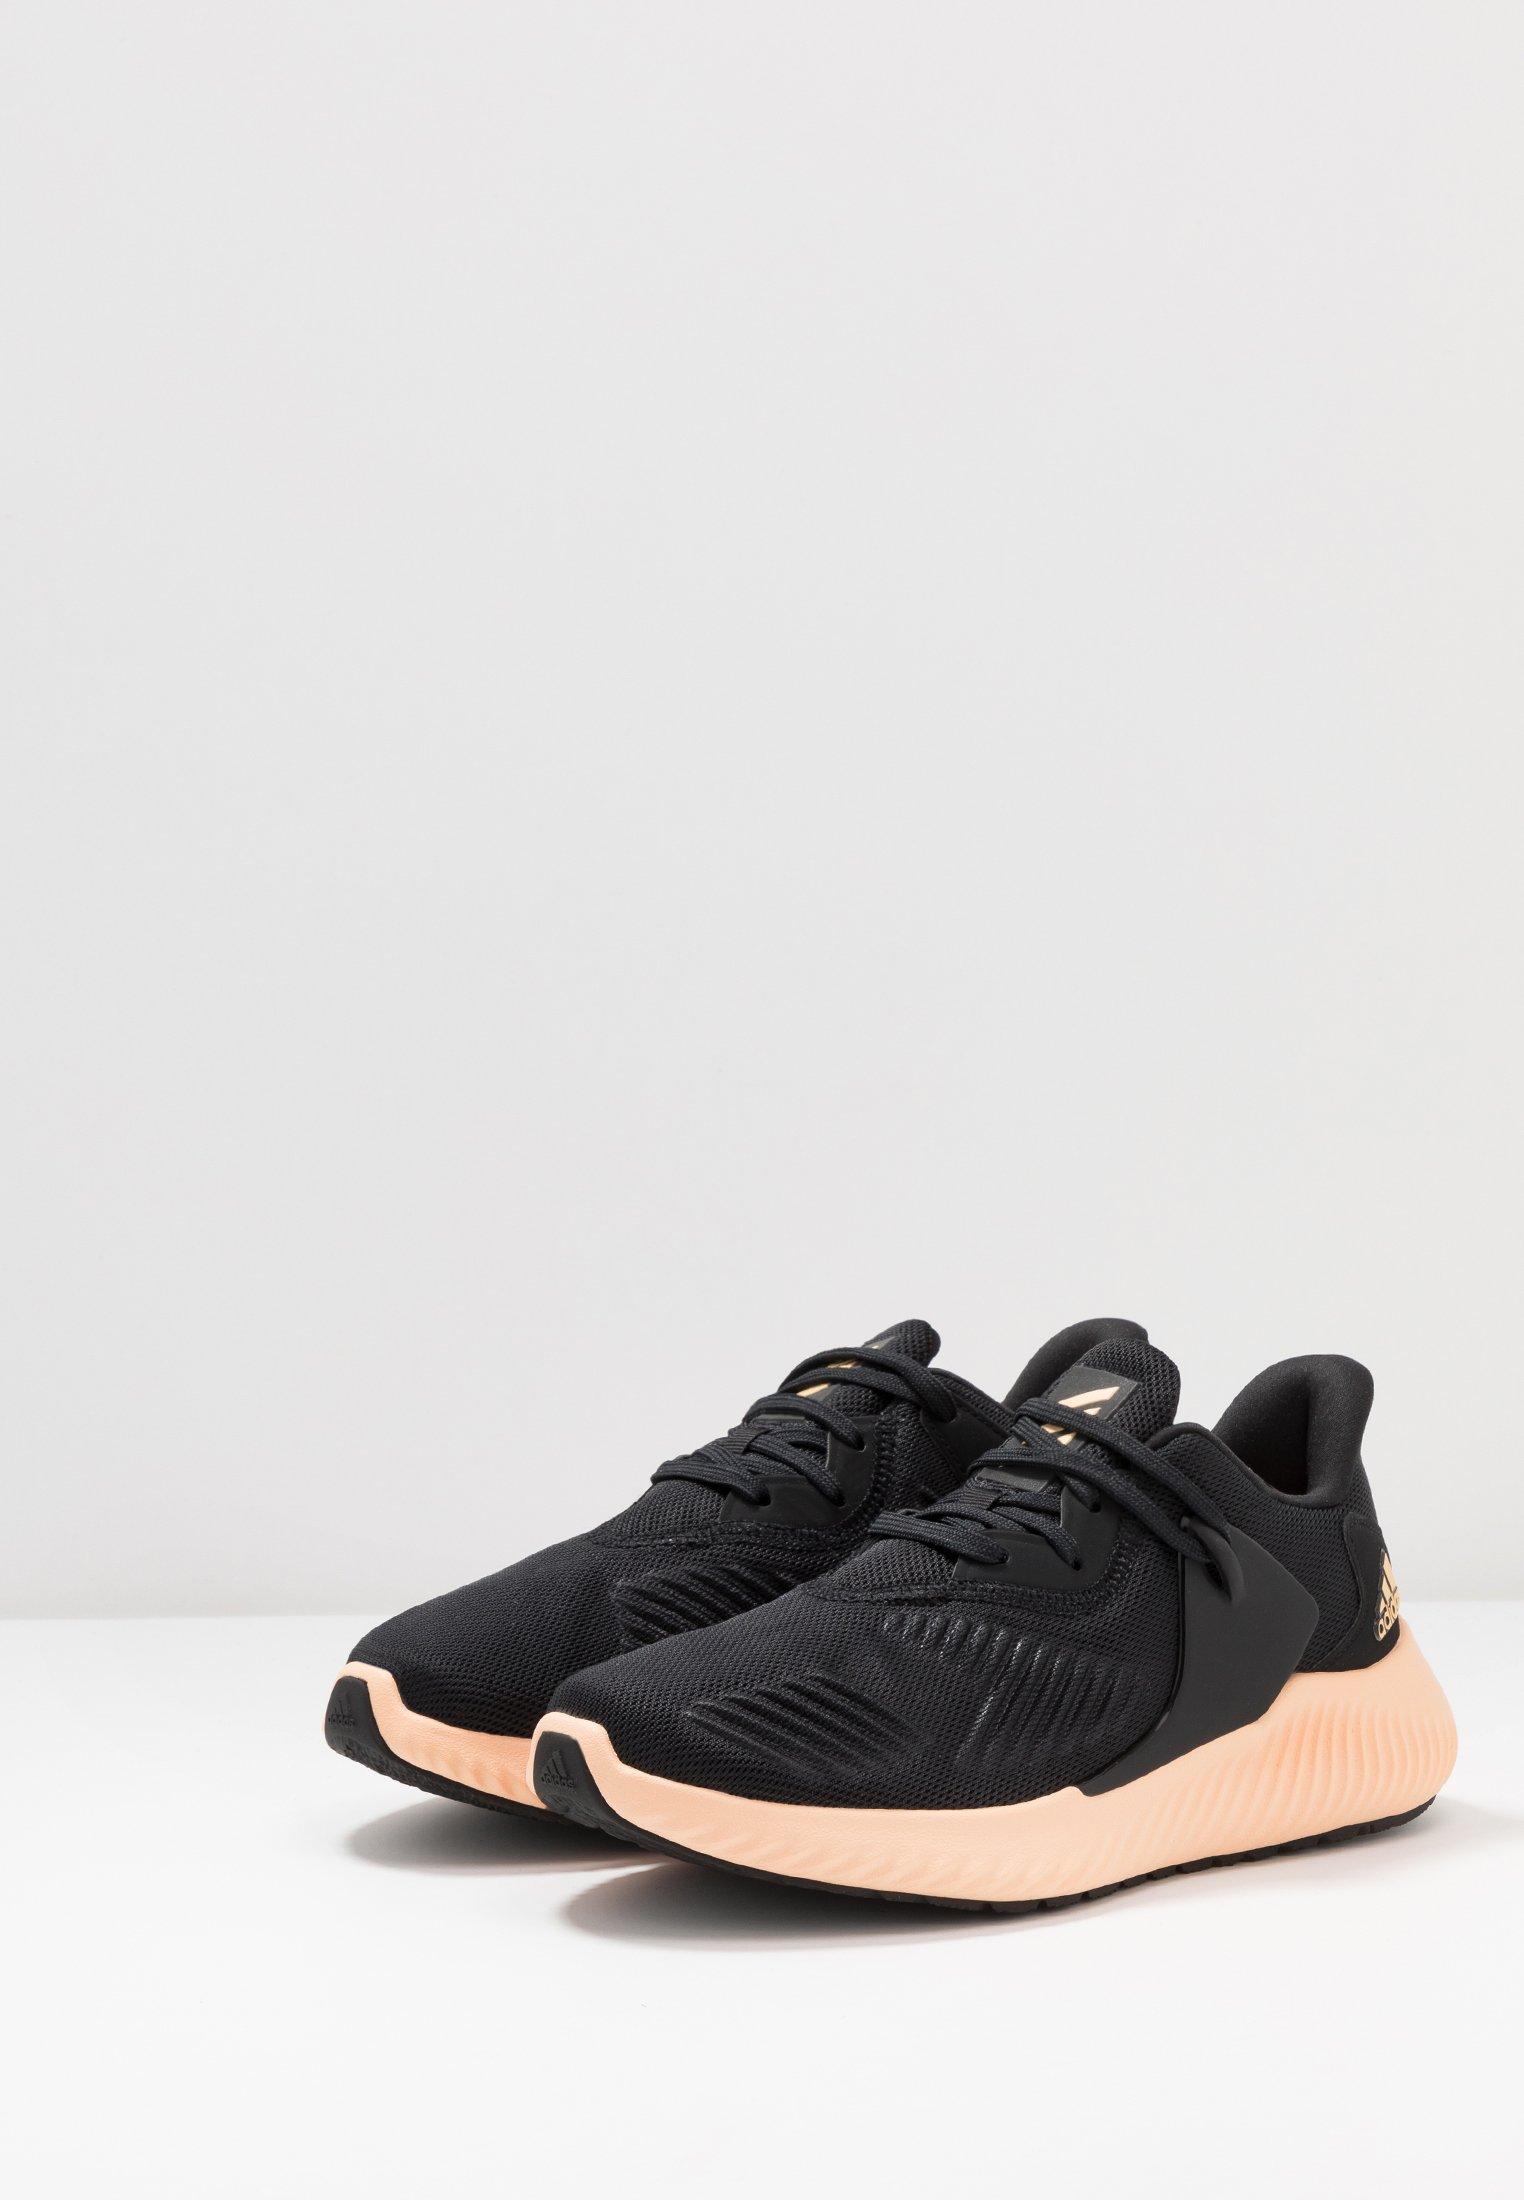 Performance Edgebounce Running Core Black Adidas 1 Orange 5Scarpe glow Neutre QChdtsr